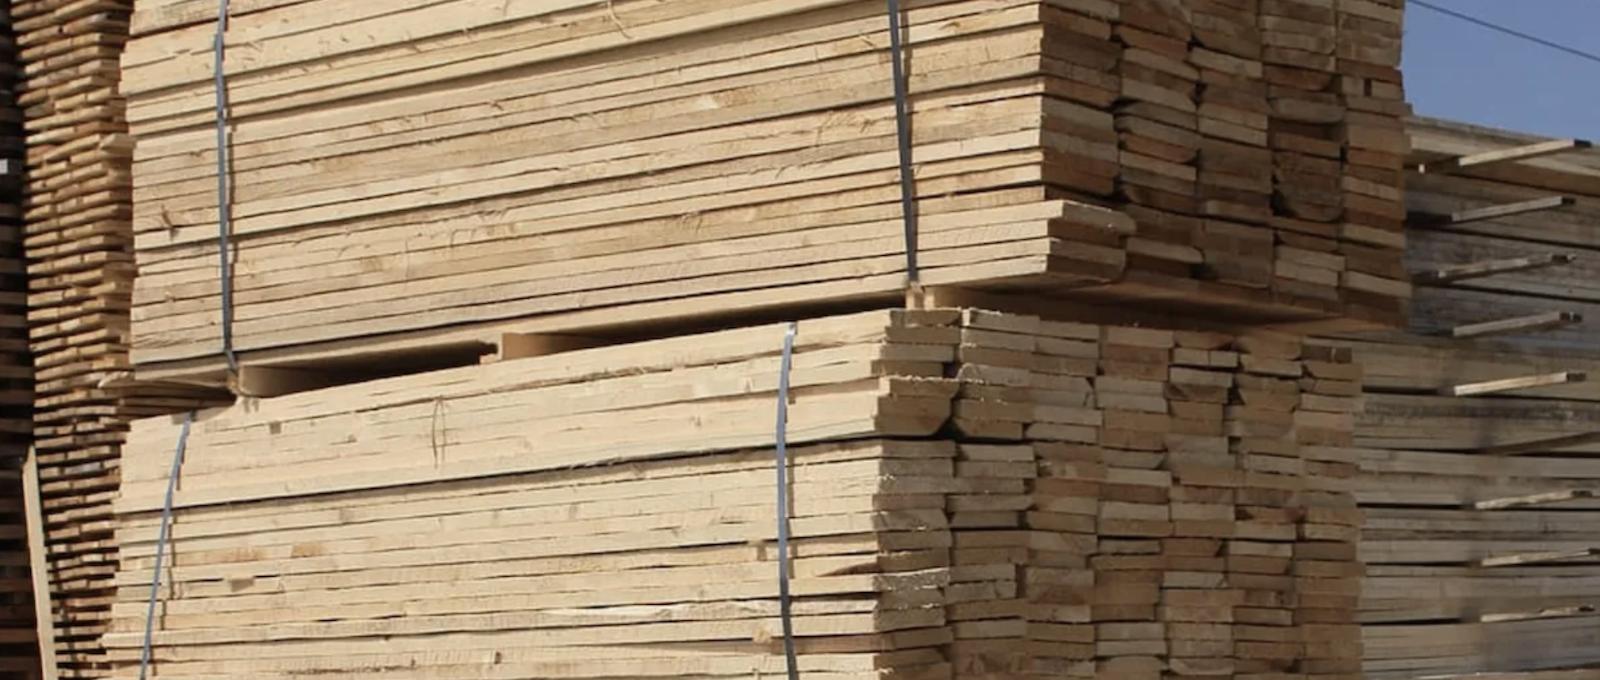 Lumber stacked in lumberyard ready for house framing